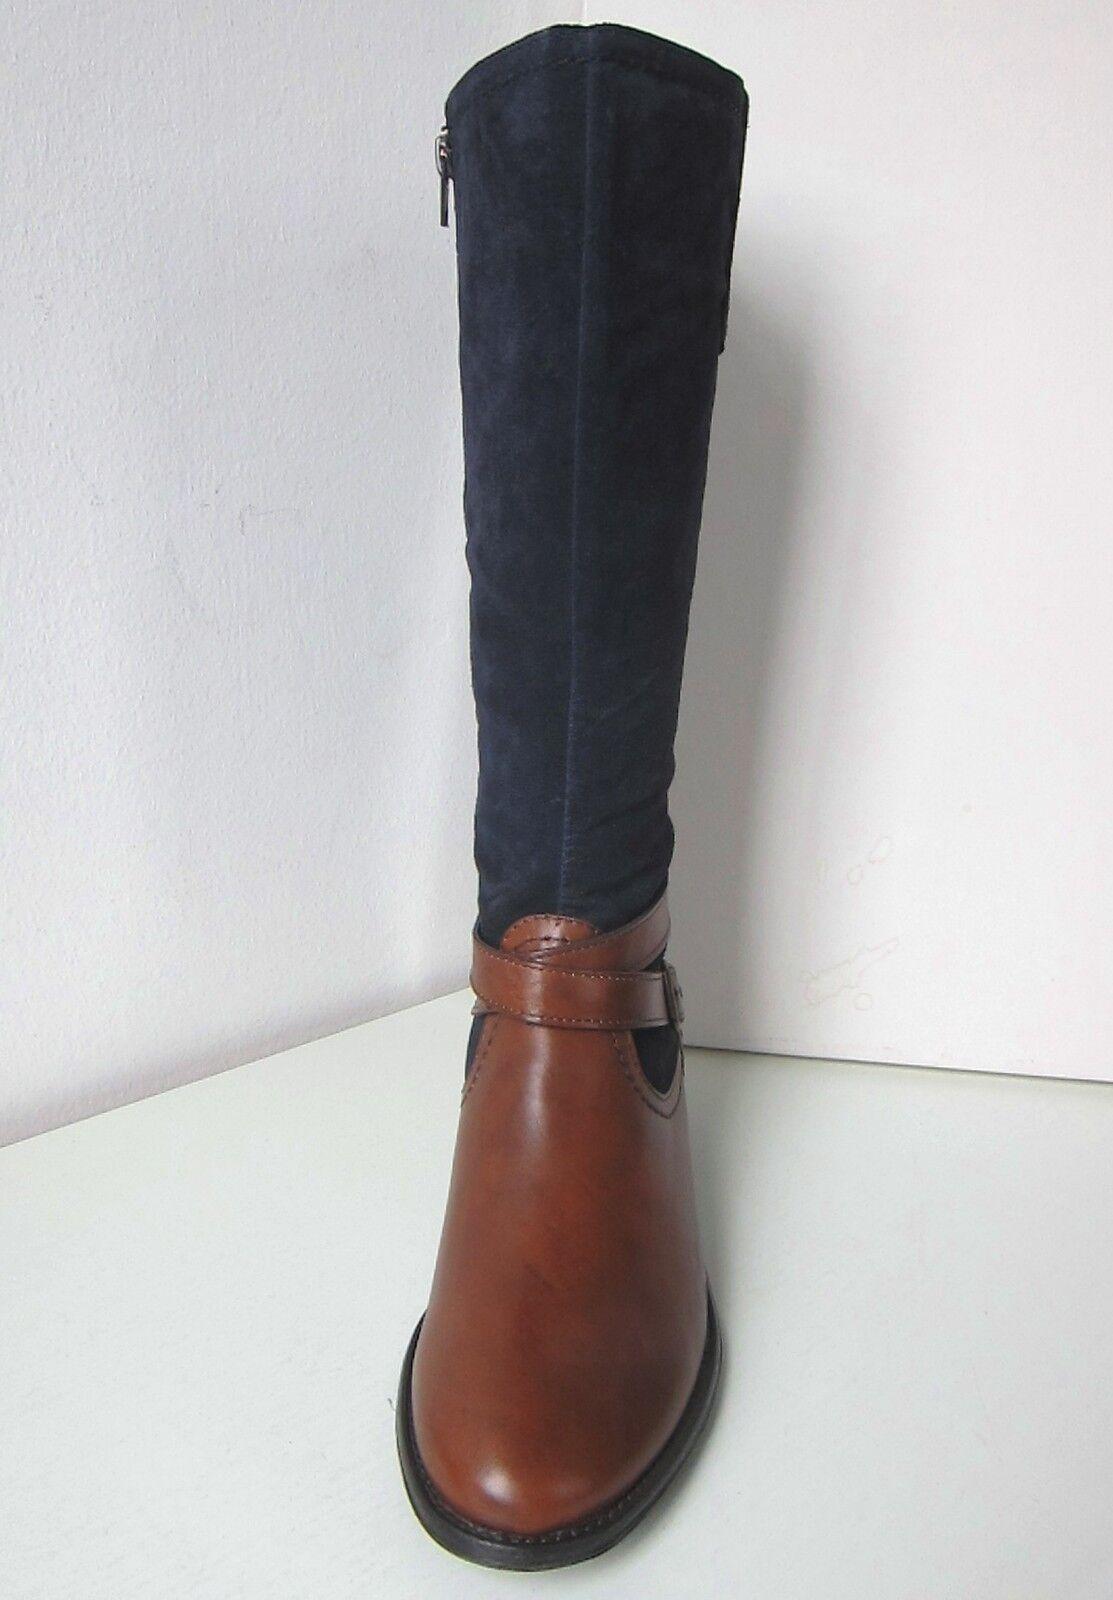 Tamaris Reit Reit Reit Stiefel Mix blau muskat Gr 38 Boots